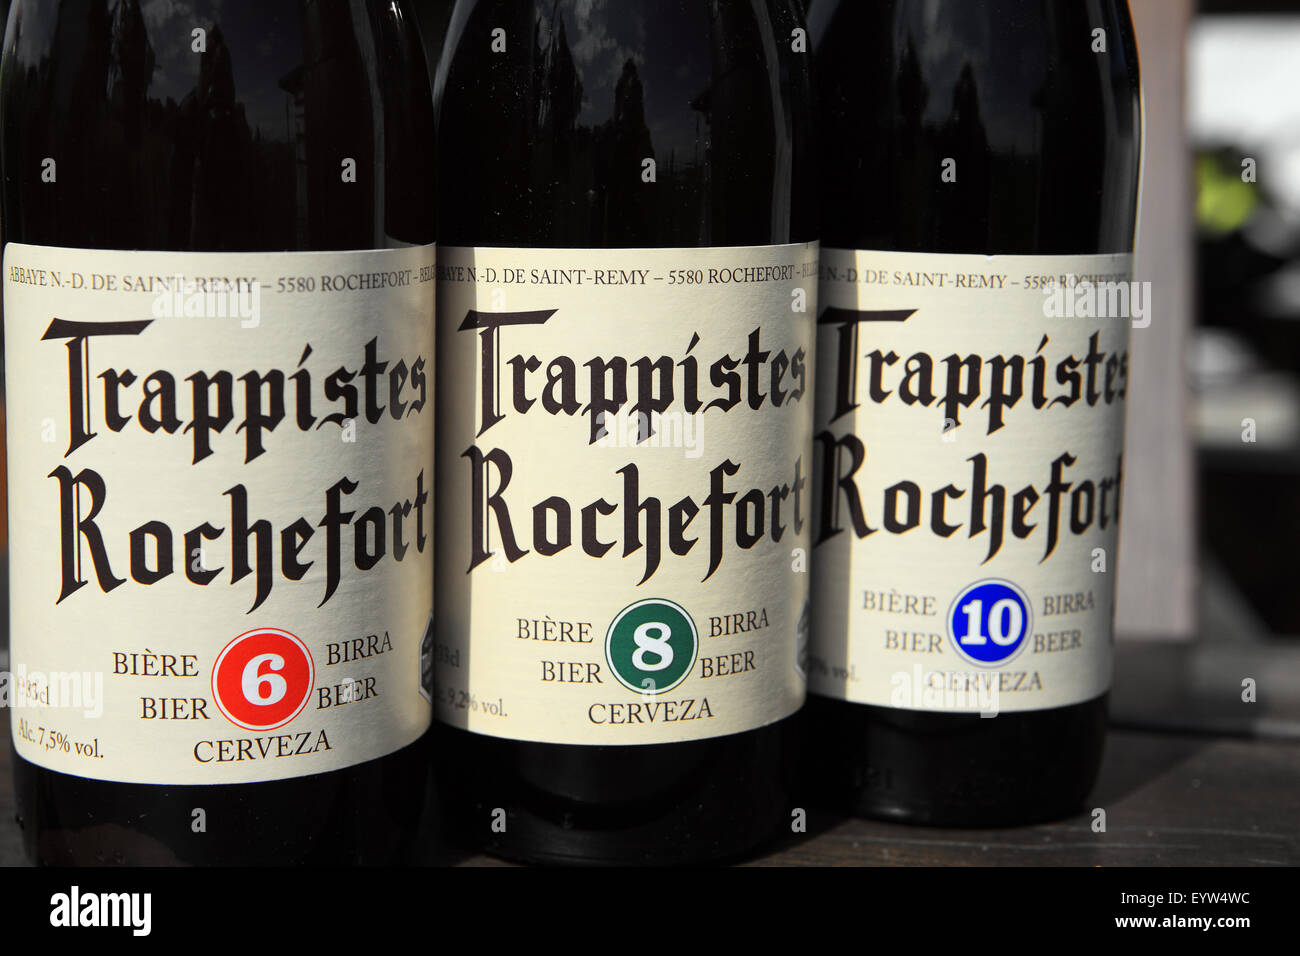 Belgian beer Trappistes Rochefort bottles of varying strengths 6, 8 & 10 - Stock Image